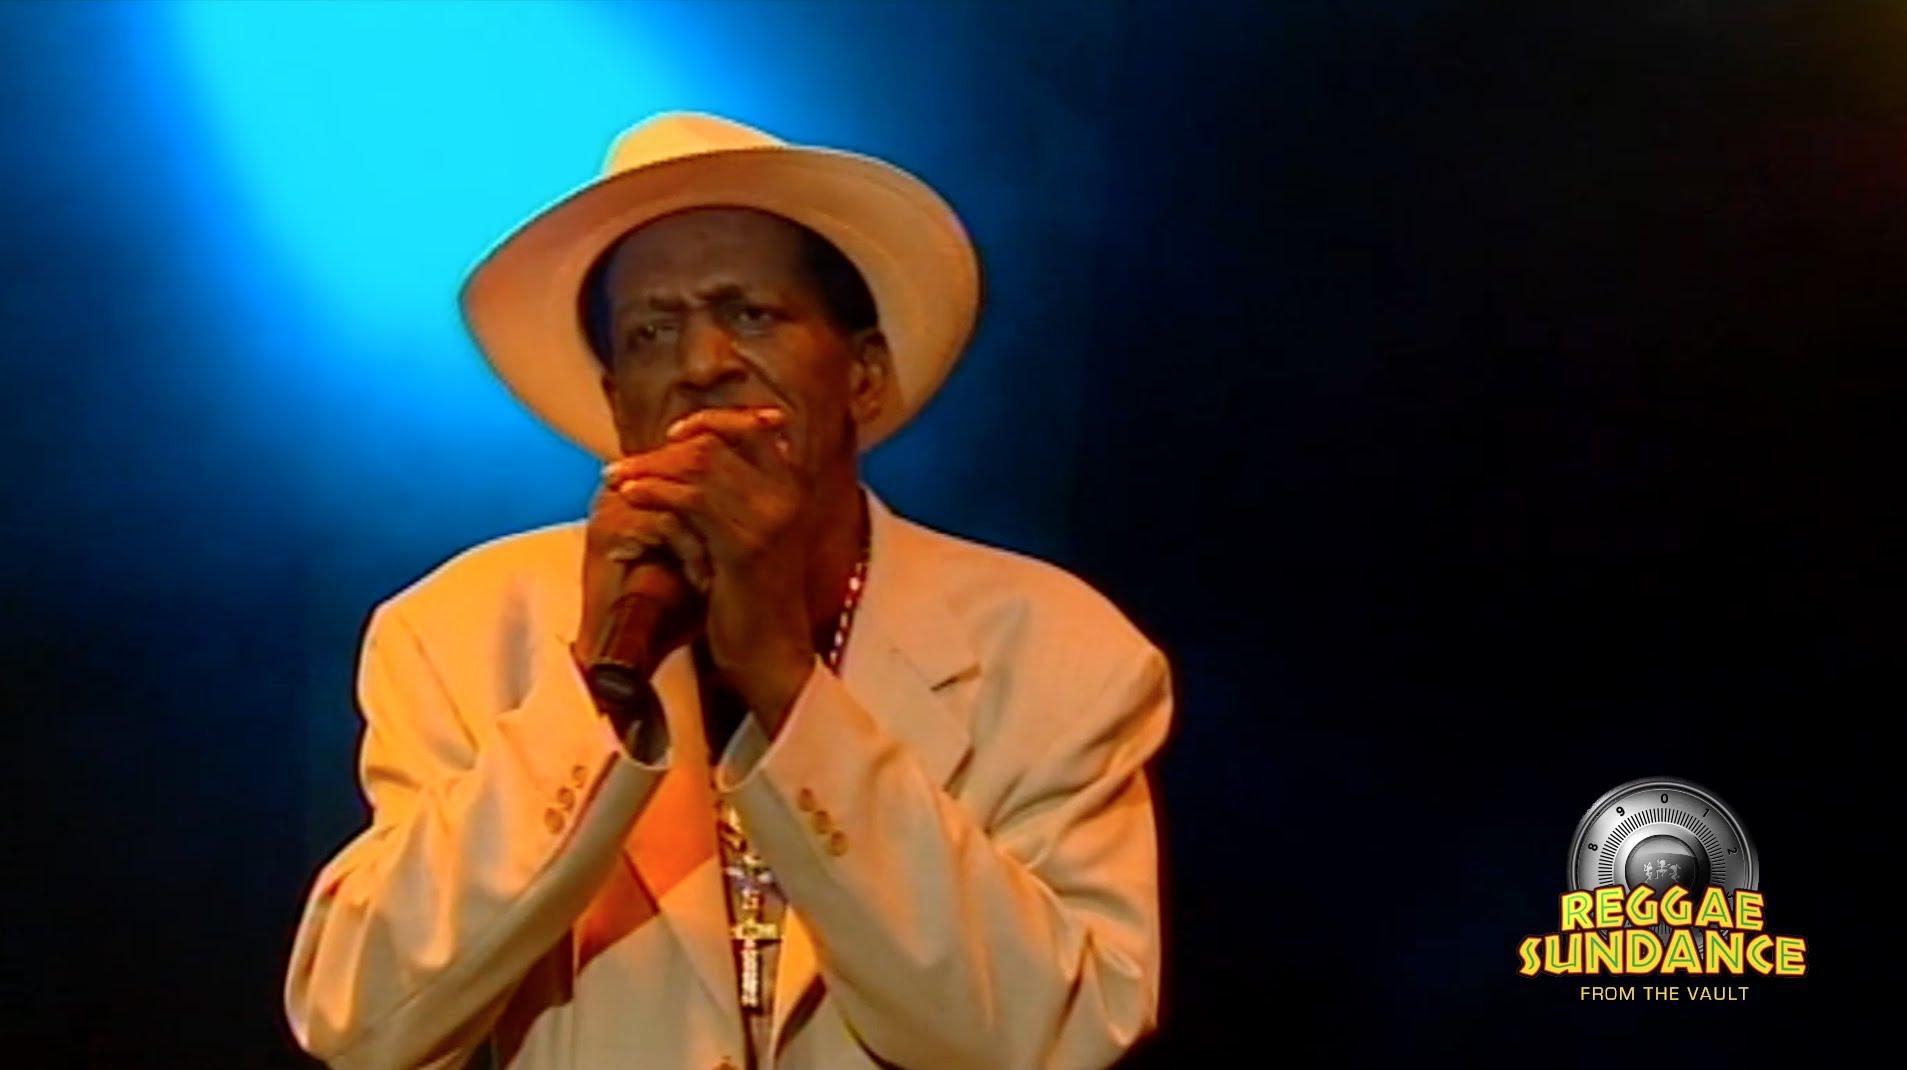 Gregory Isaacs @ Reggae Sundance 2007 [8/12/2007]